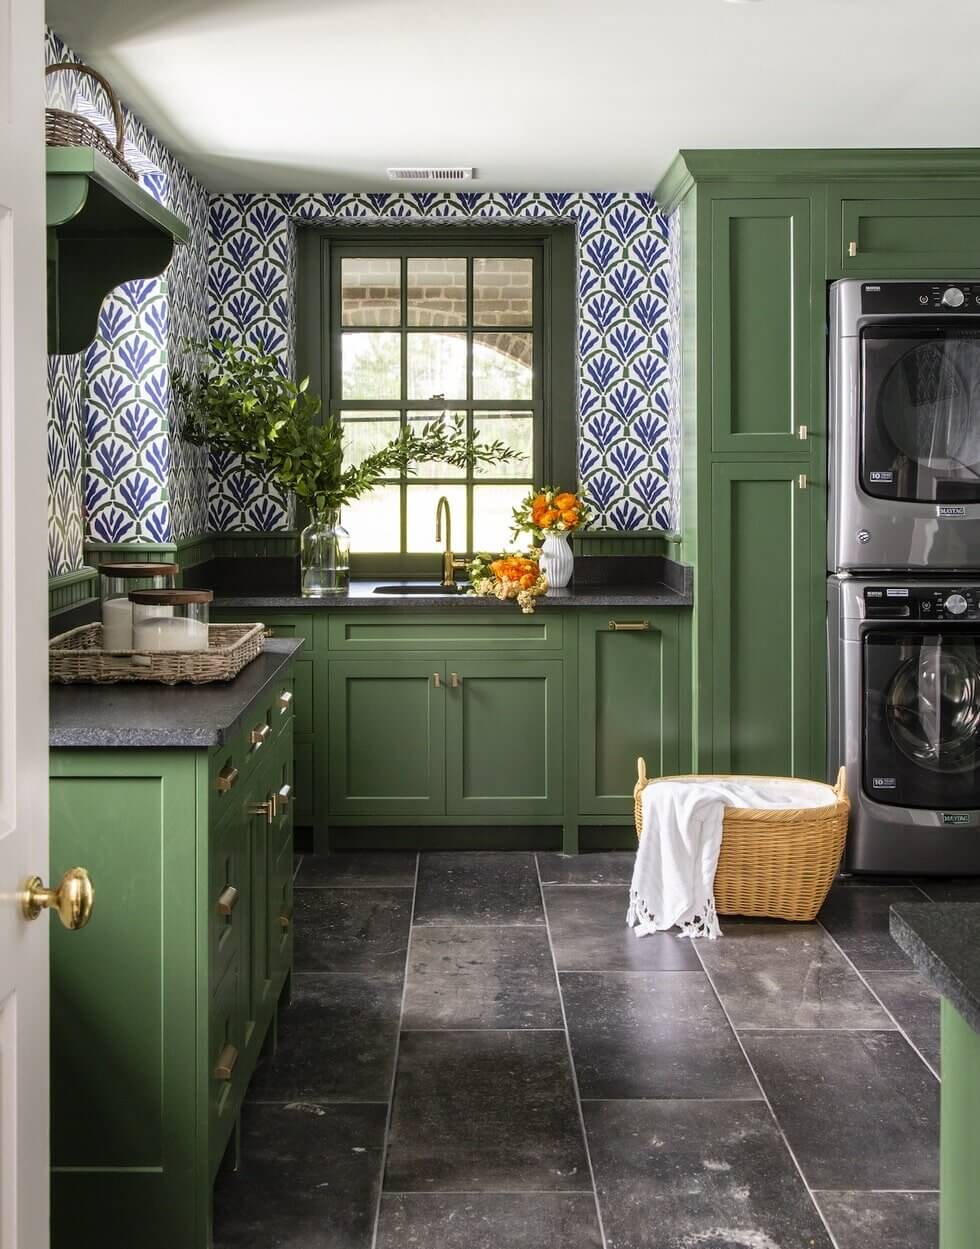 green-kitchen-blue-tiles-nordroom